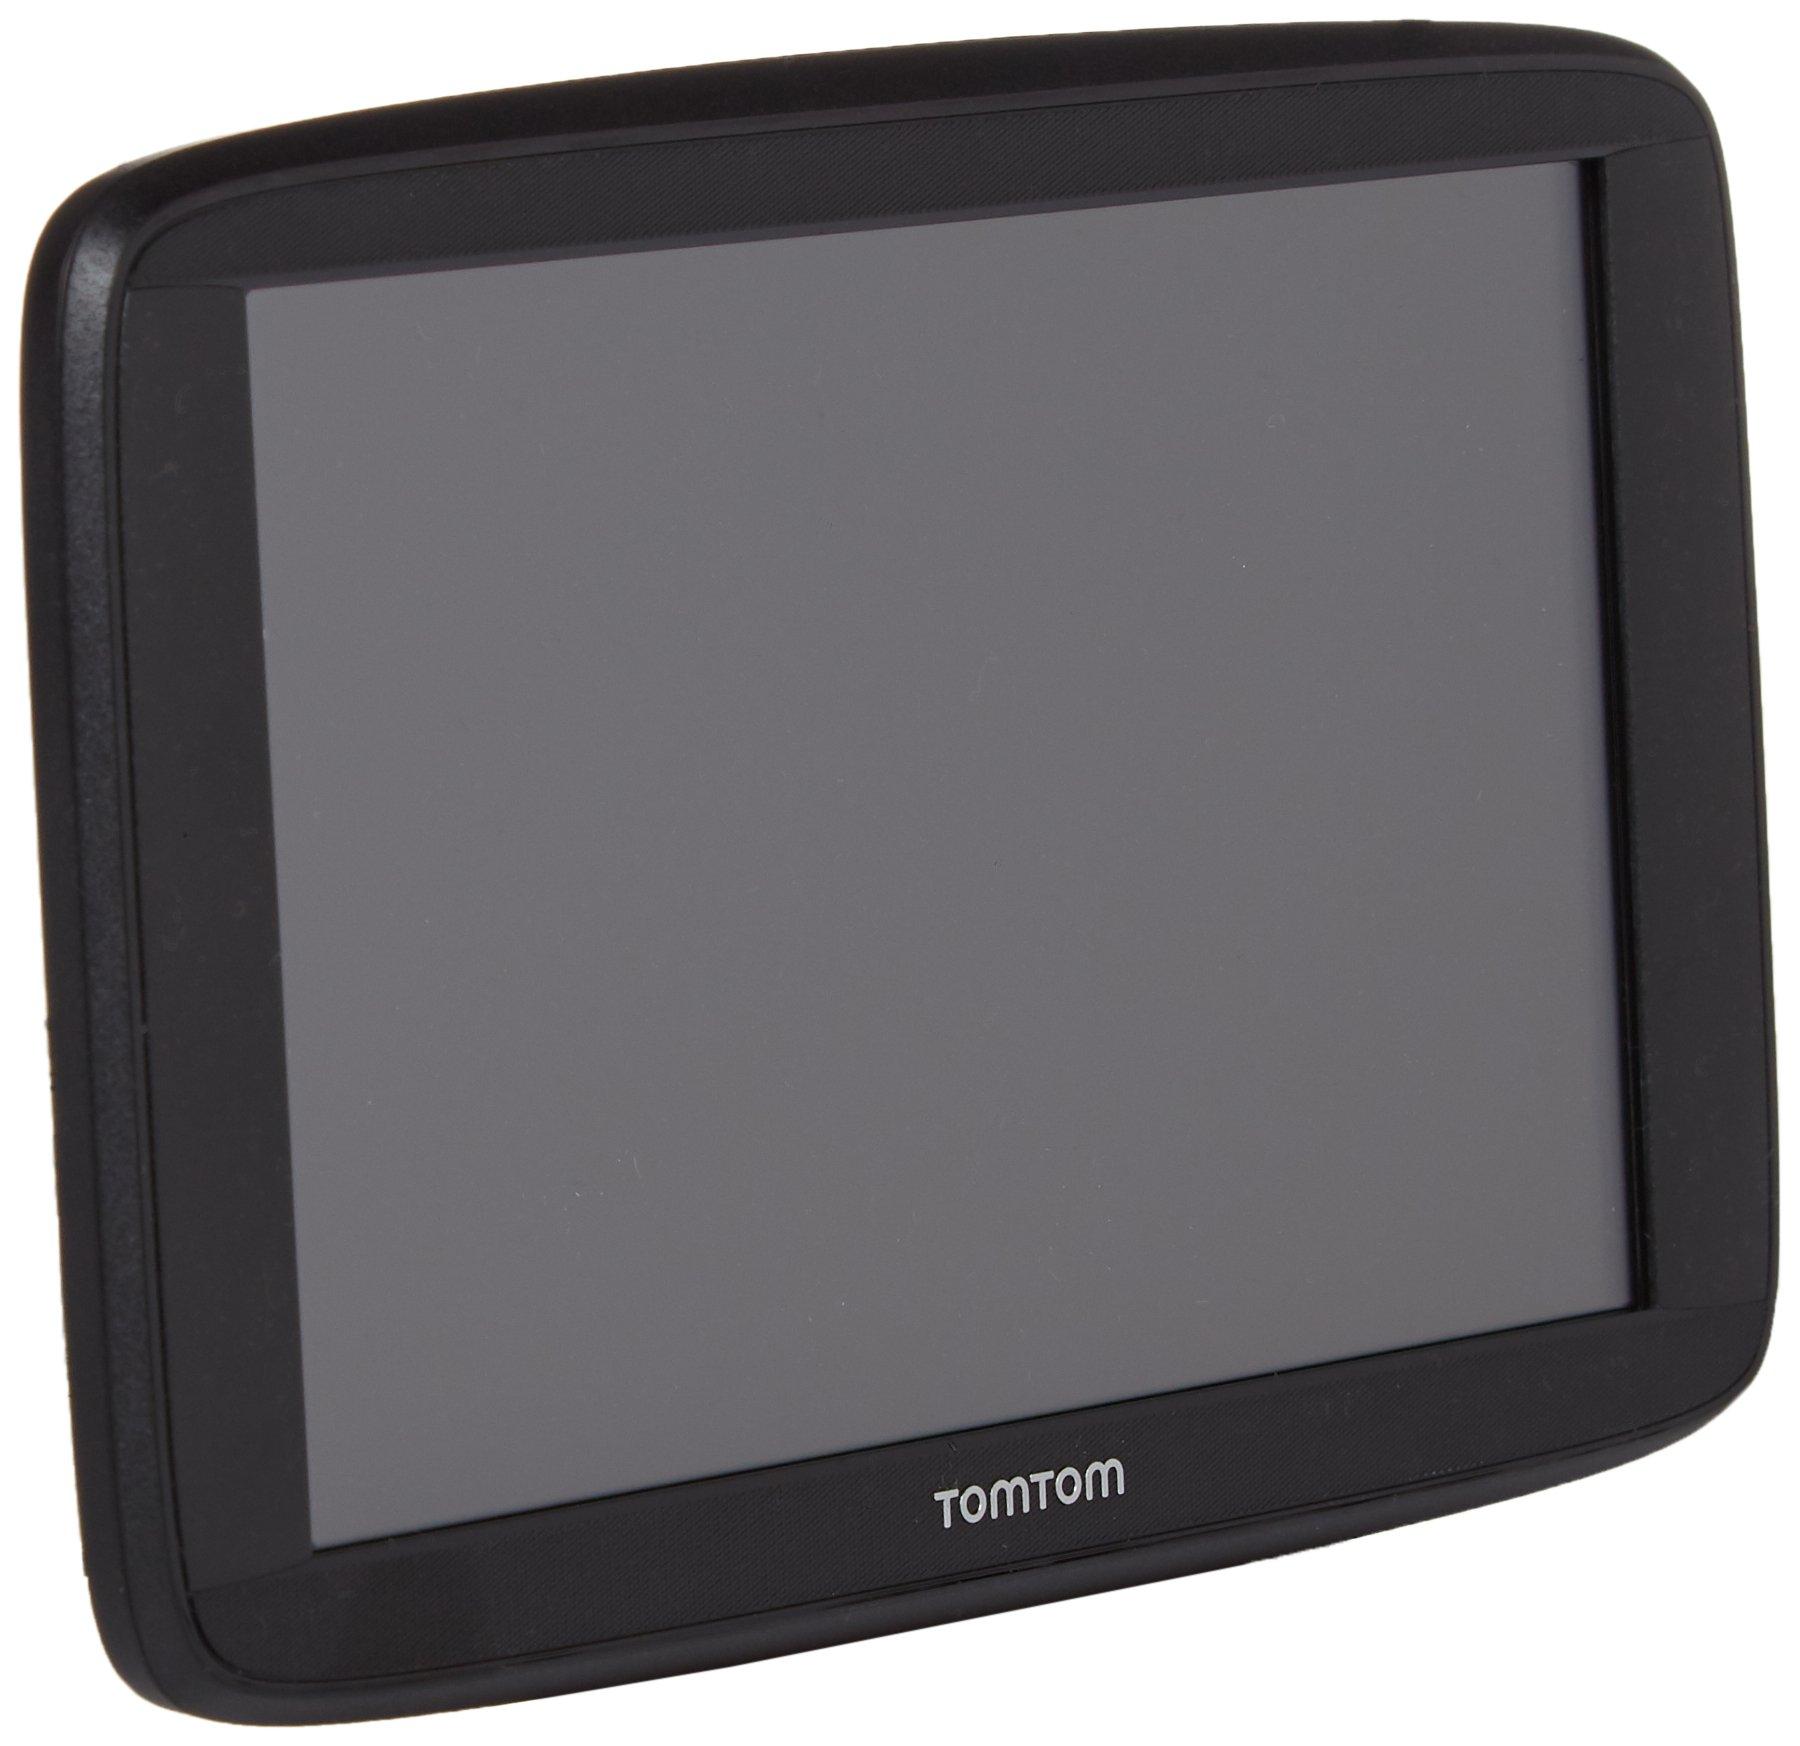 Tomtom VIA 1625M Automobile Portable GPS Navigator - Mountable, Portable